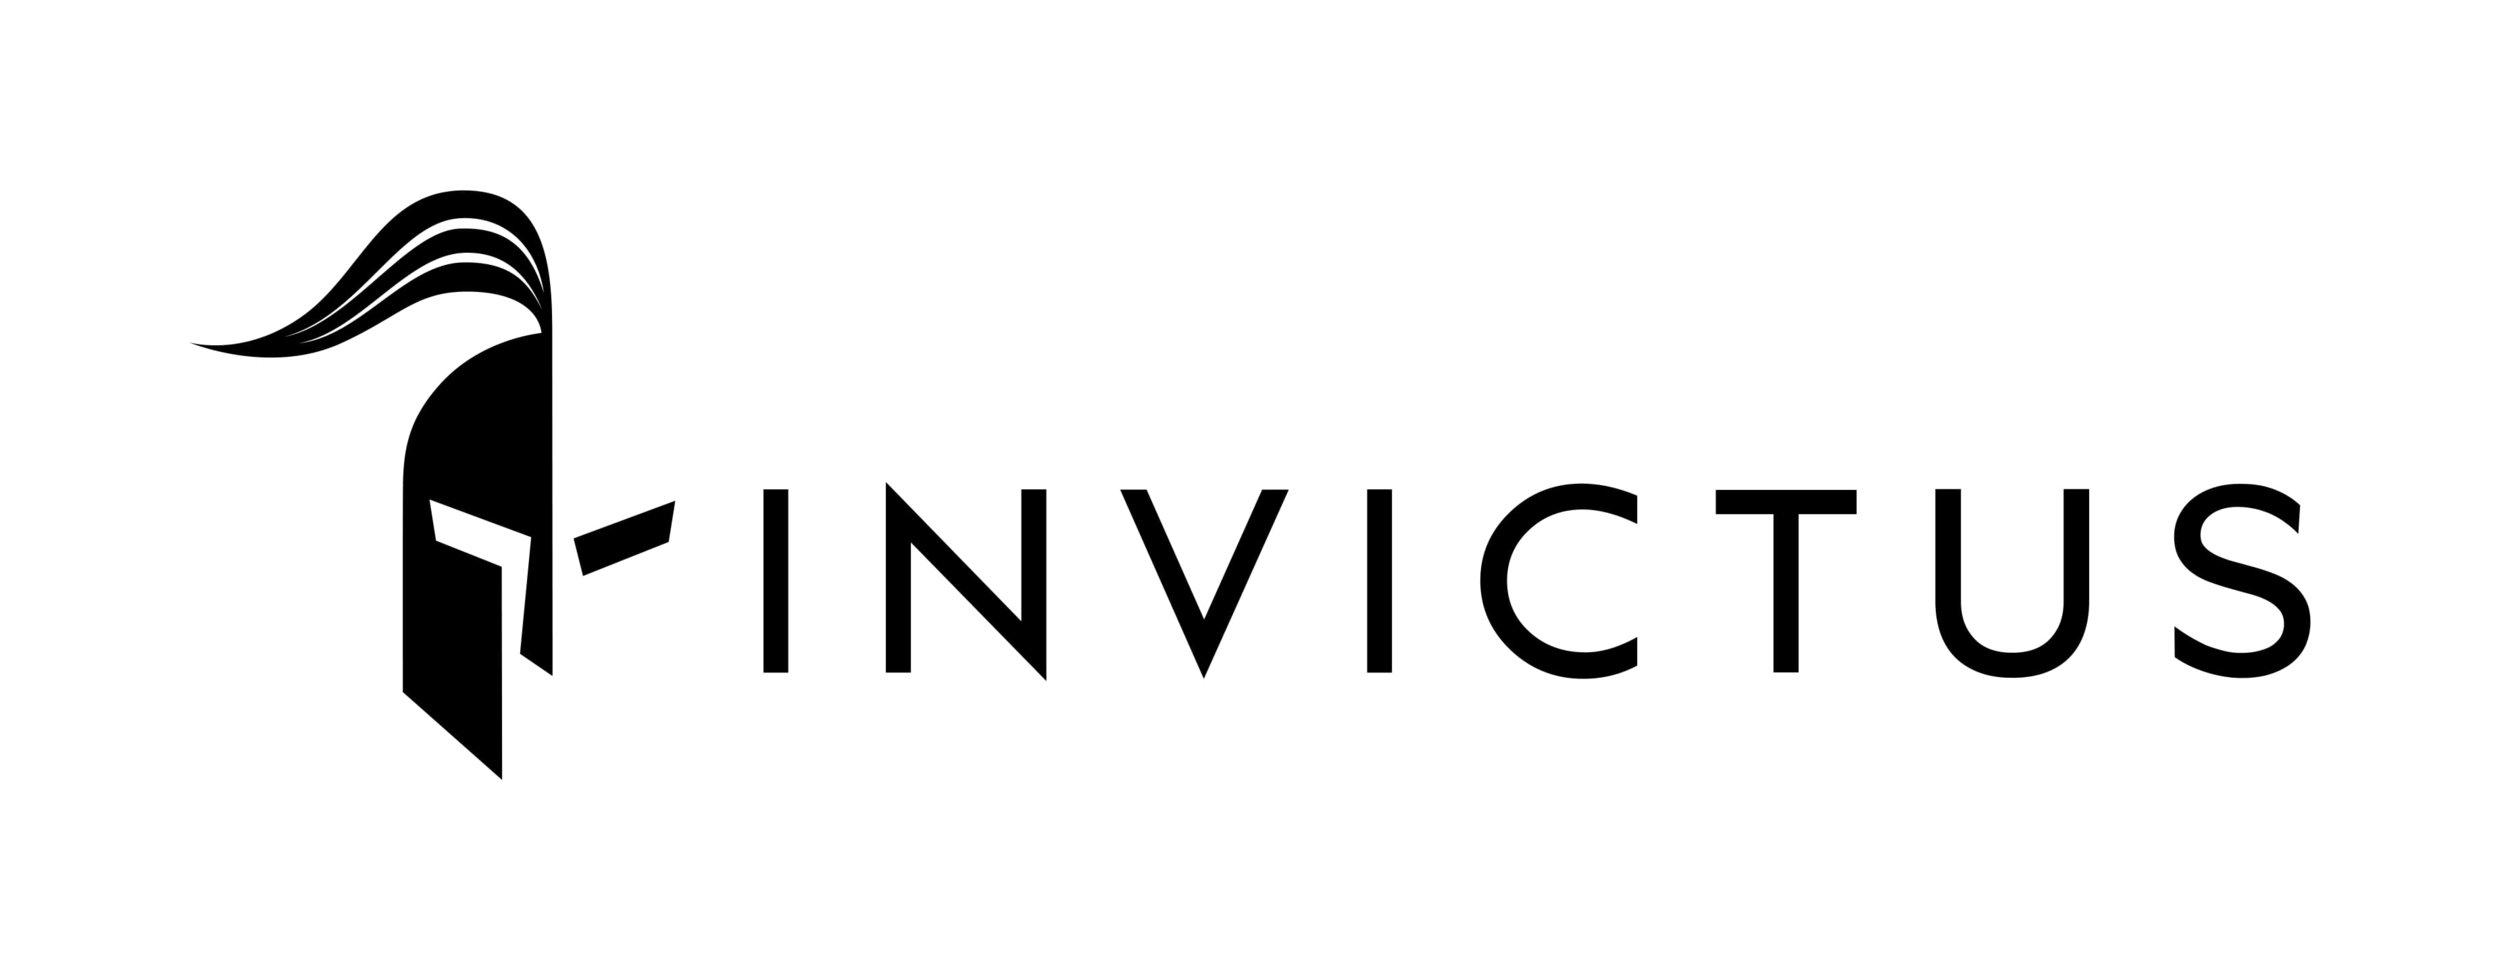 invictus black logo only 01-1.jpg